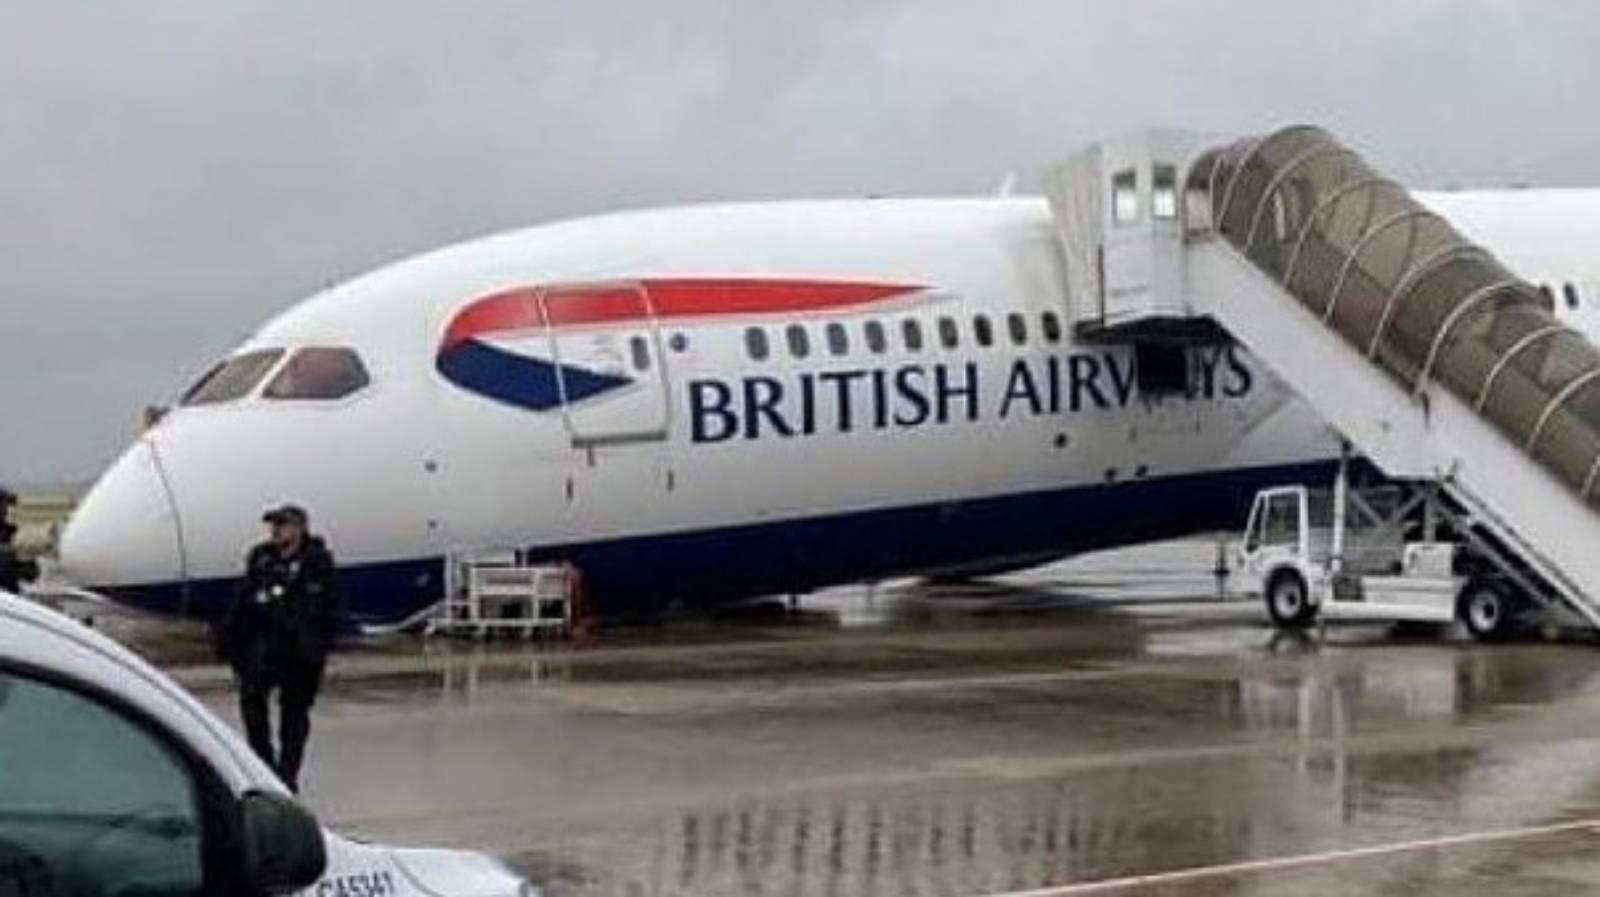 British Airways plane collapses at Heathrow